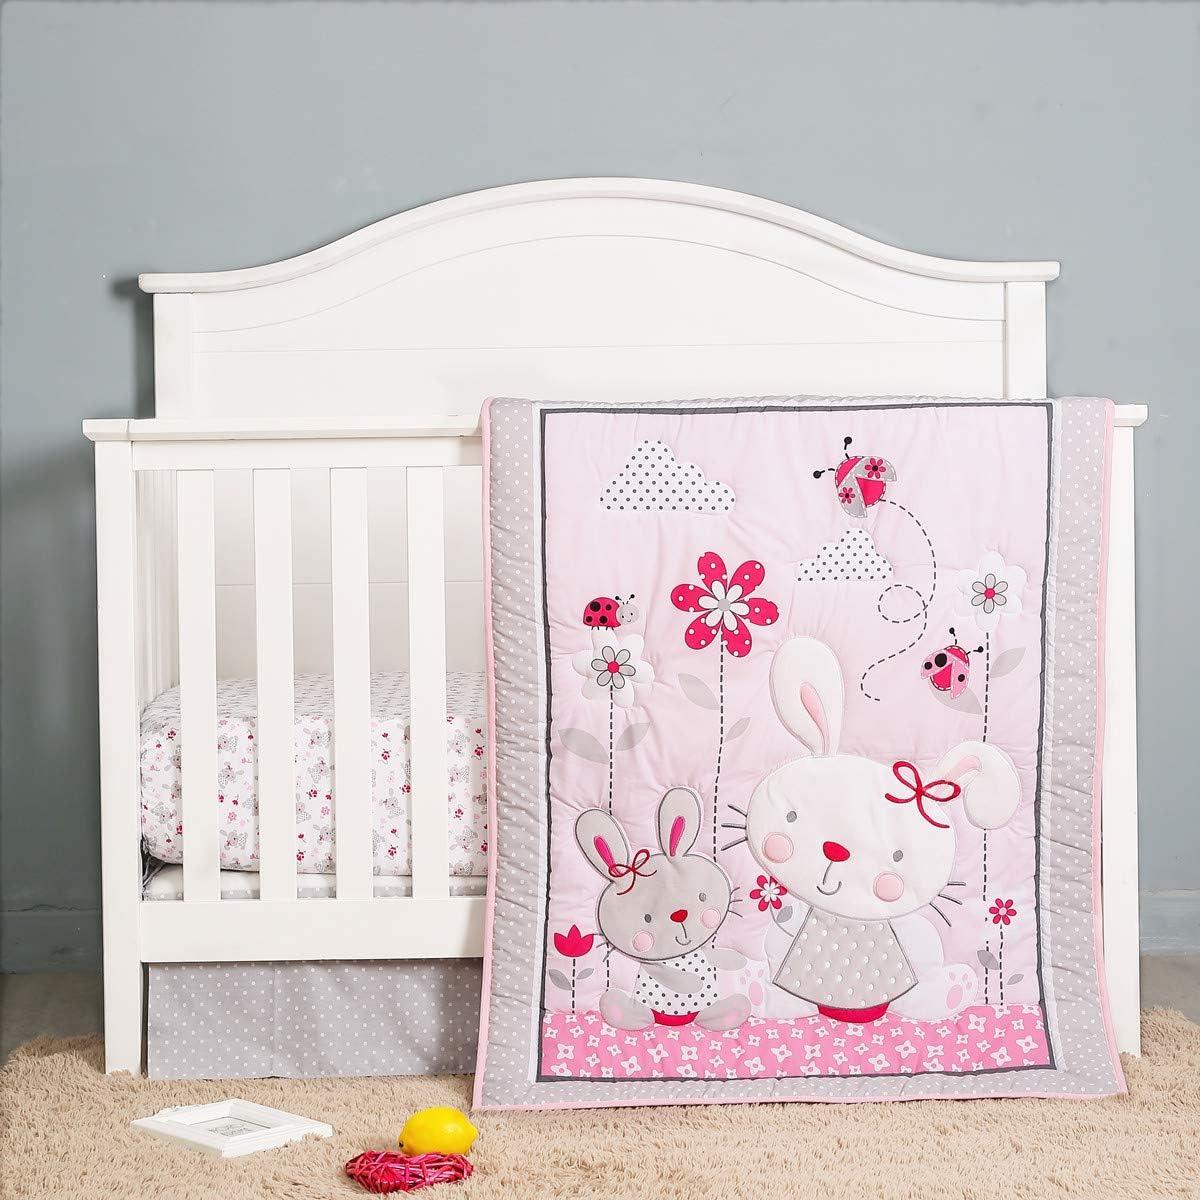 Floral Garden Baby Nursery Crib Bedding Sets for Girls 3 Piece Pink Grey,Crib Comforter, Fitted Sheet,Crib Skirt